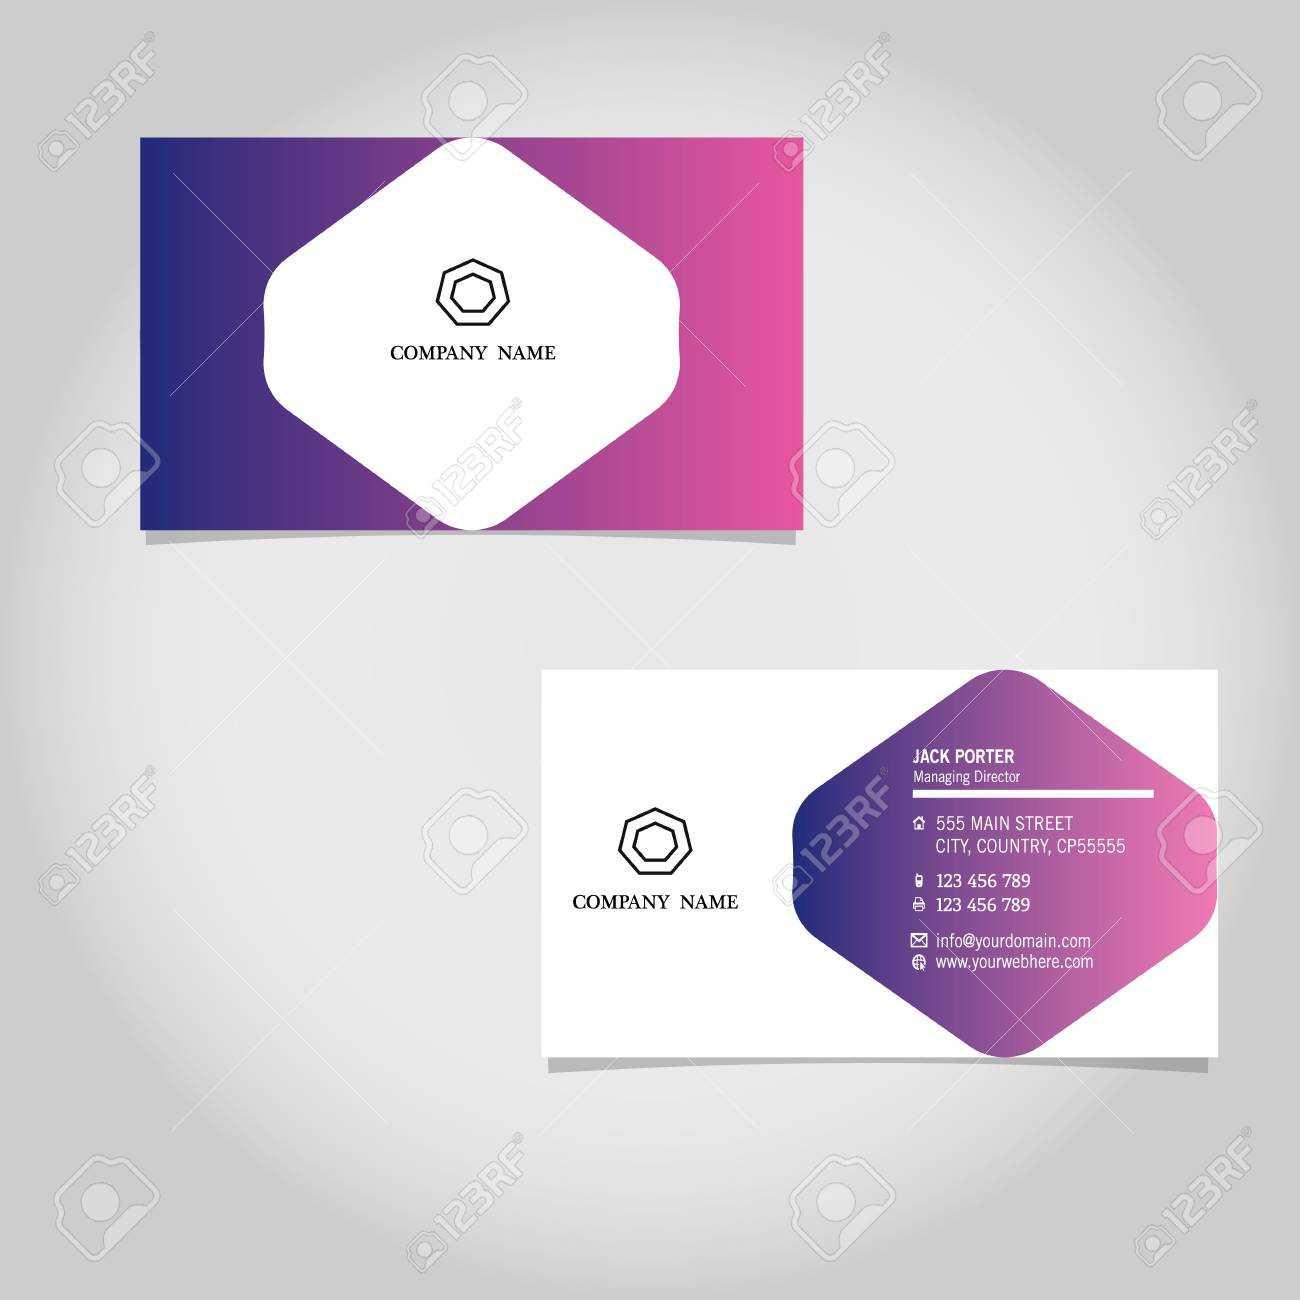 Vector Business Card Template Design Adobe Illustrator With Adobe Illustrator Business Card Template